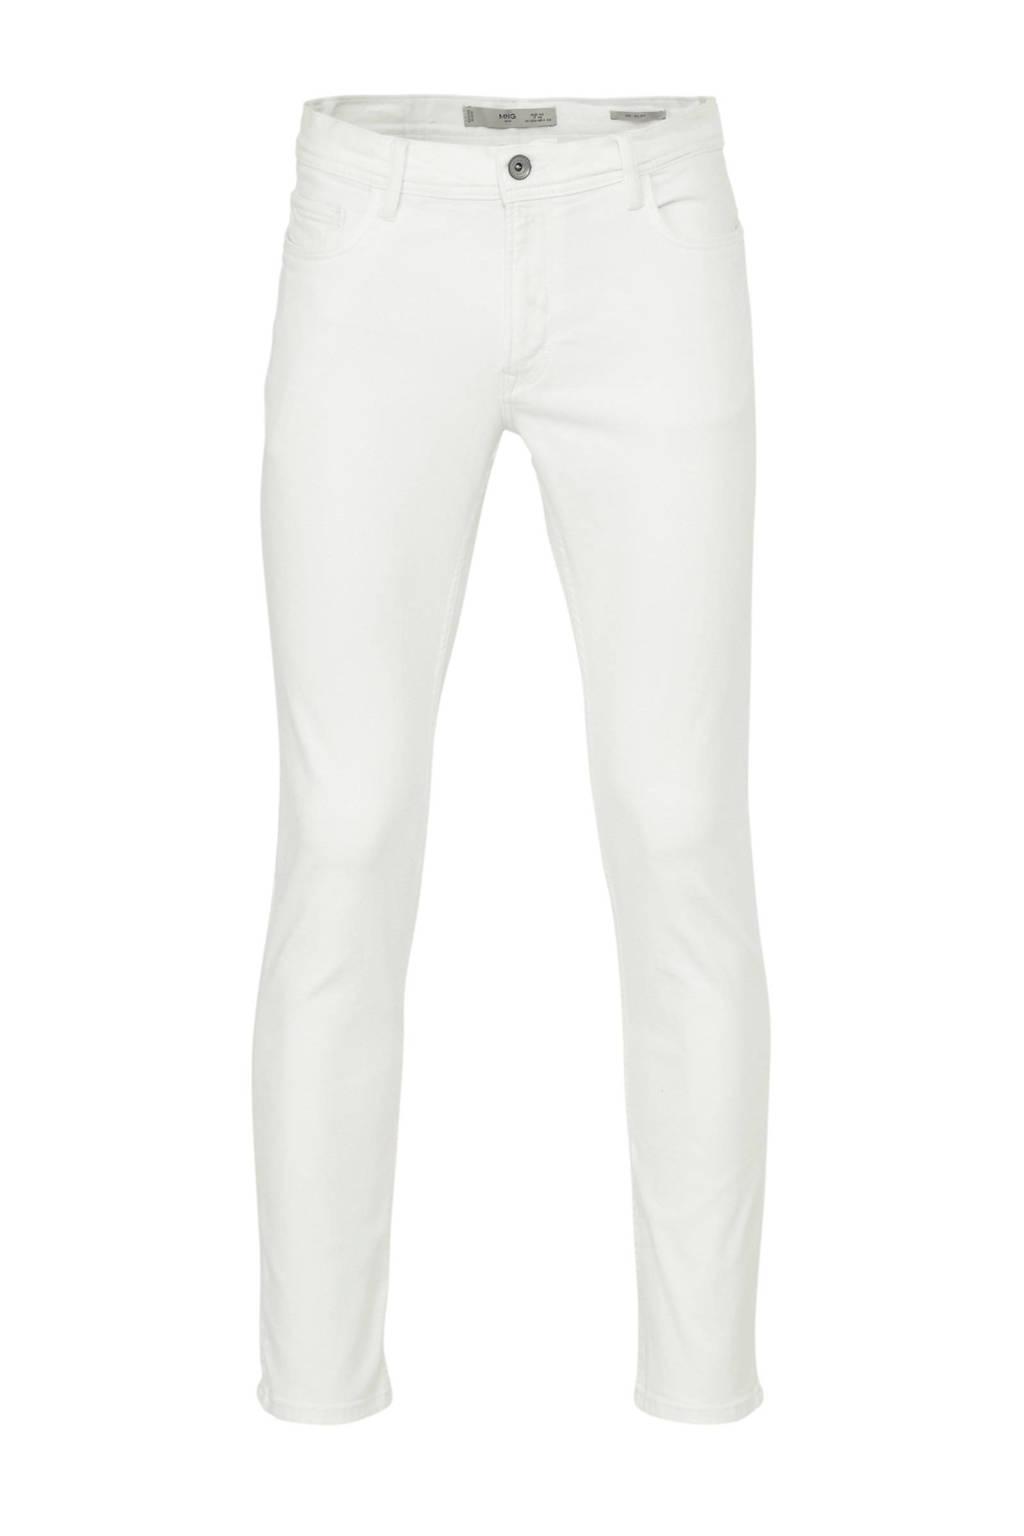 Mango Man slim fit jeans Jan wit, Wit